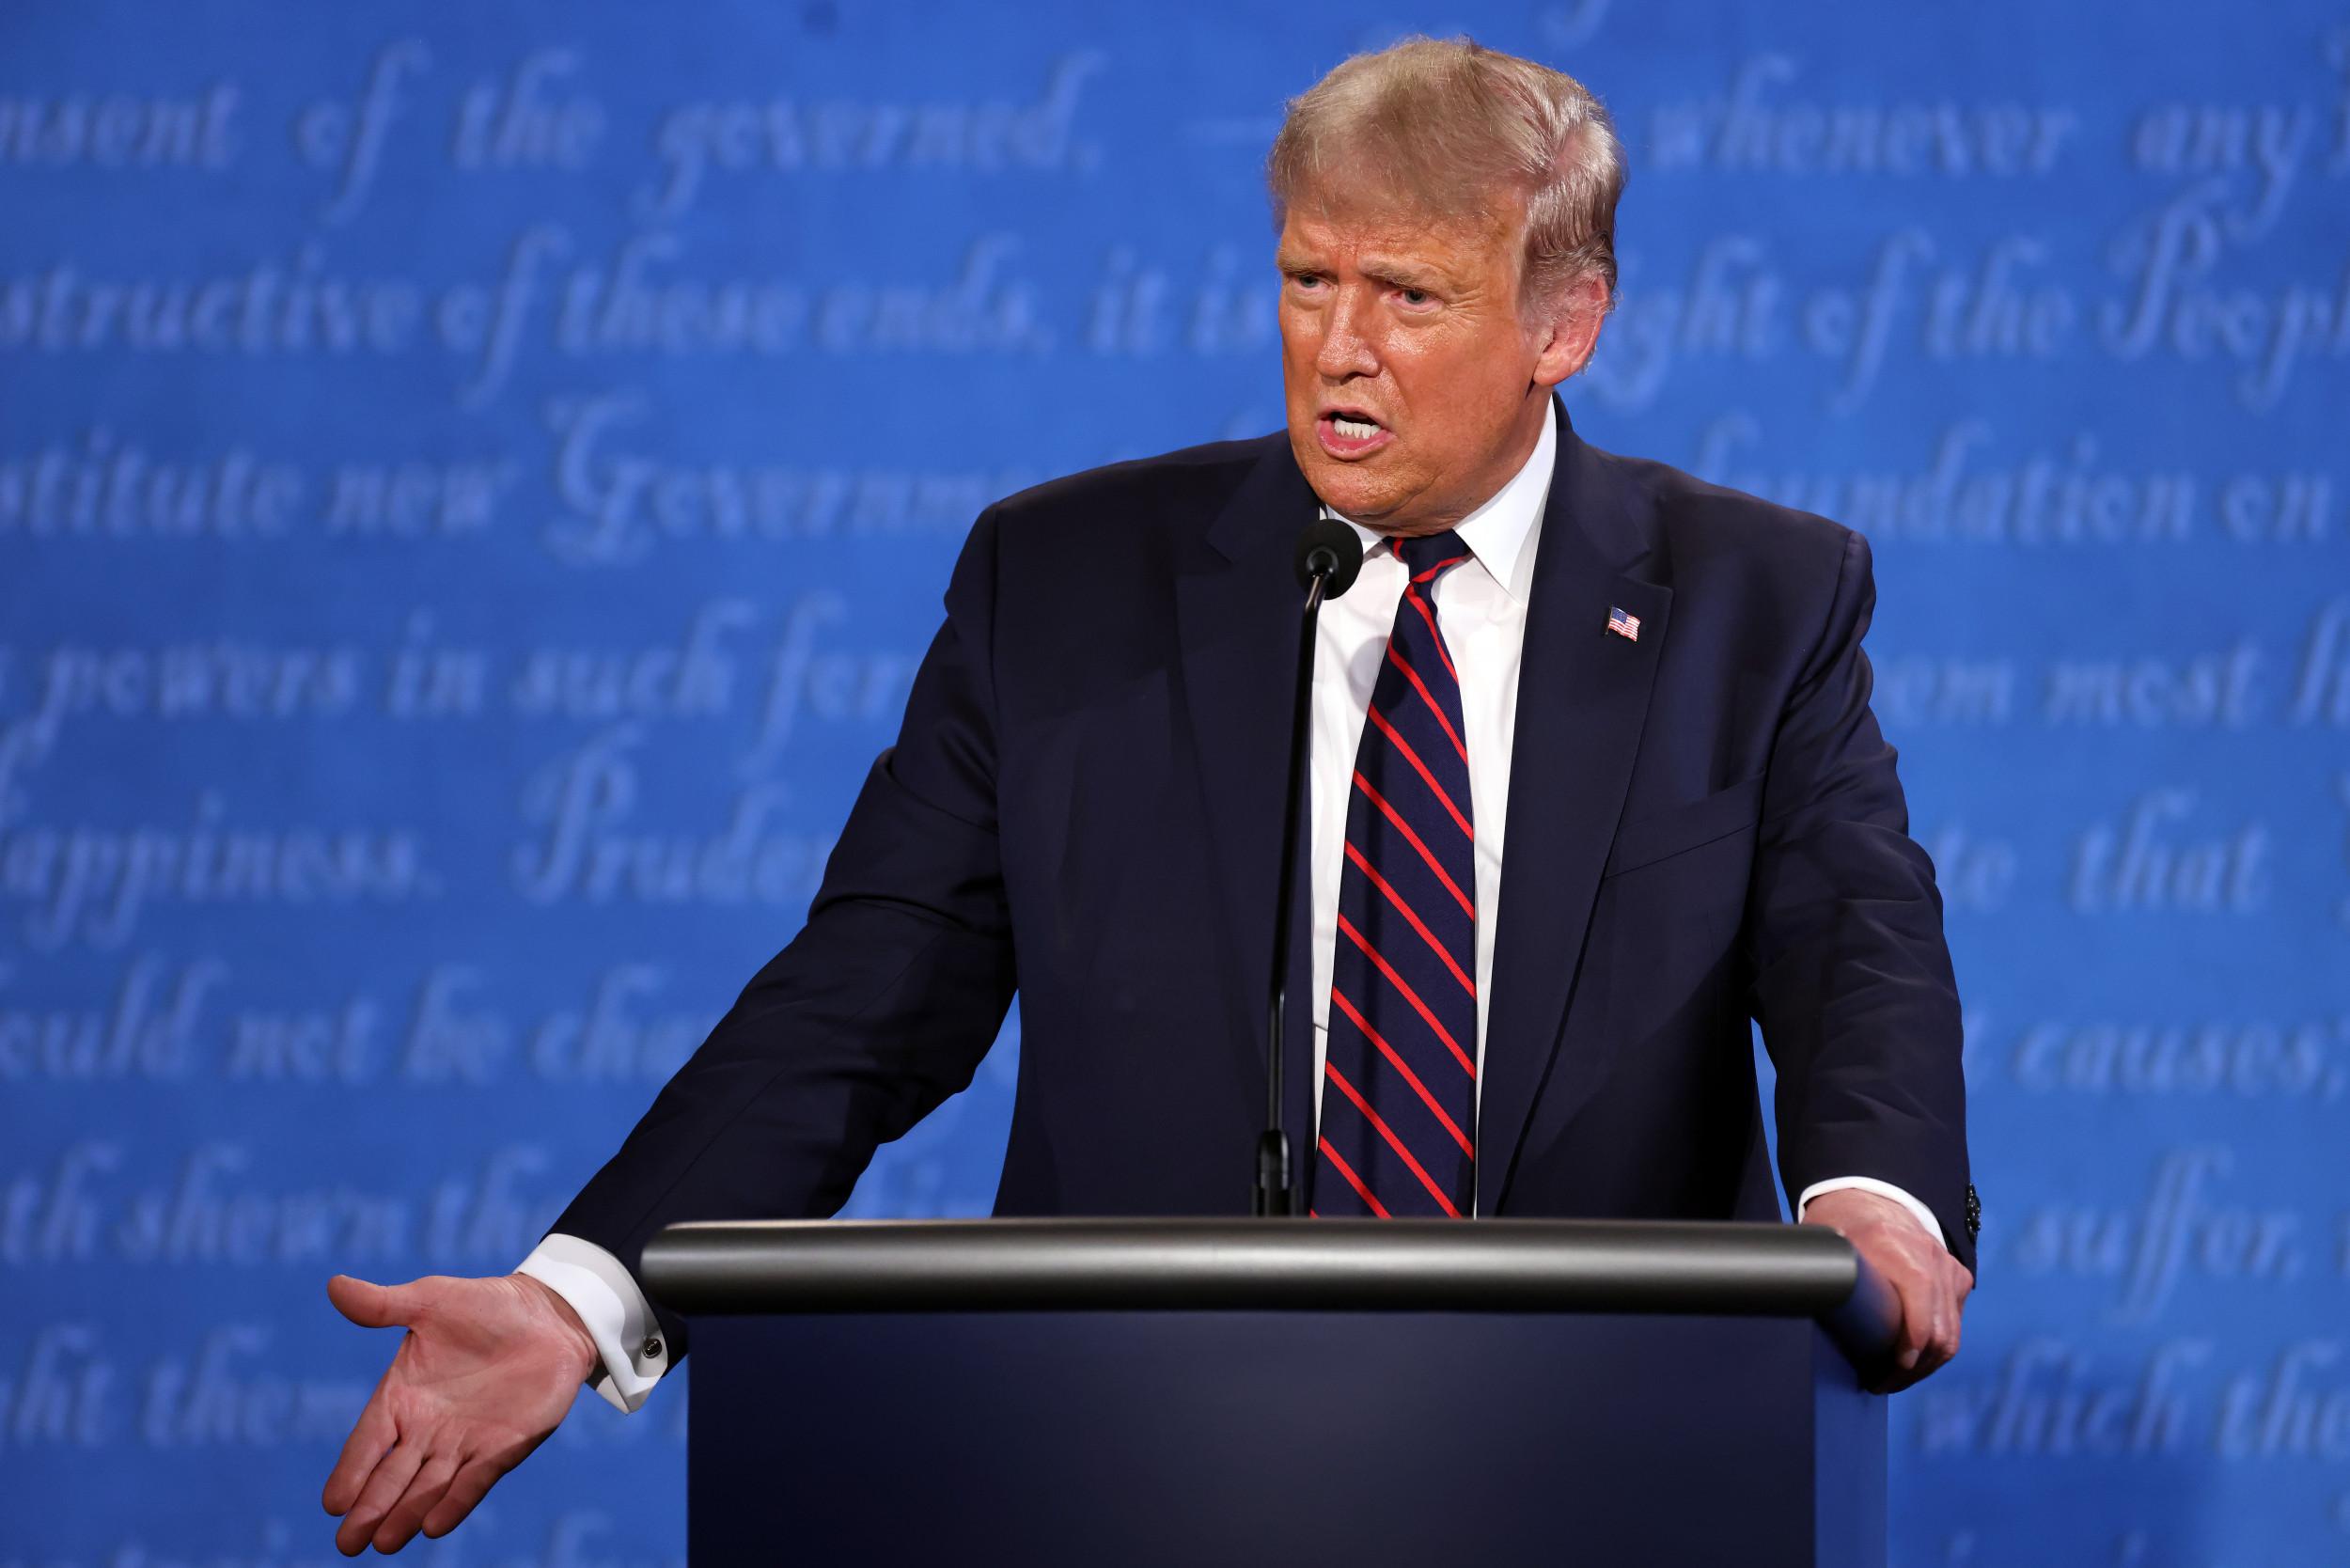 66 percent of Spanish-speaking Americans in Telemundo poll think Trump just won the debate